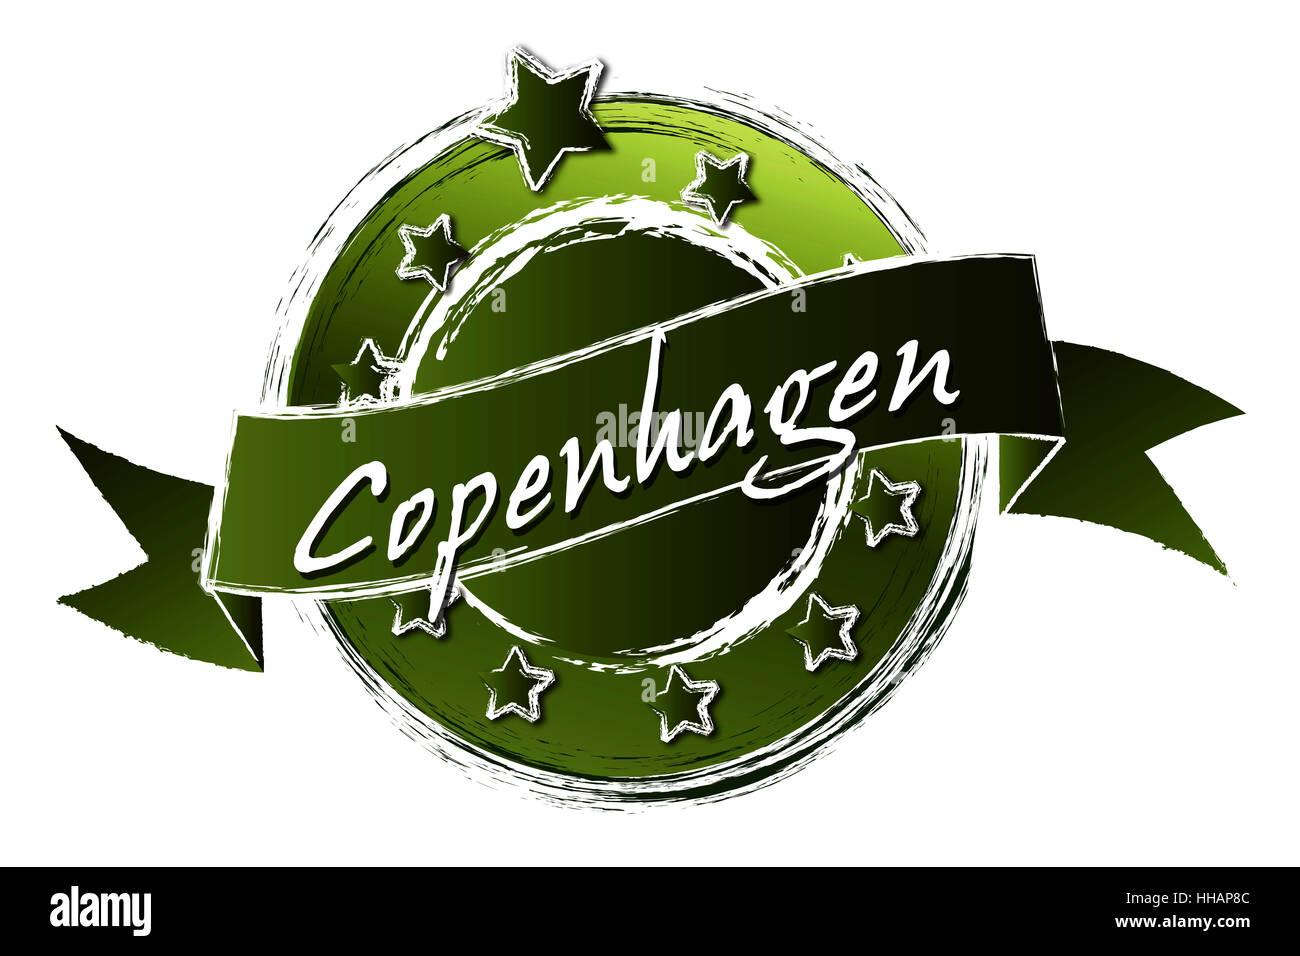 Royal grunge - Copenaghen Foto Stock